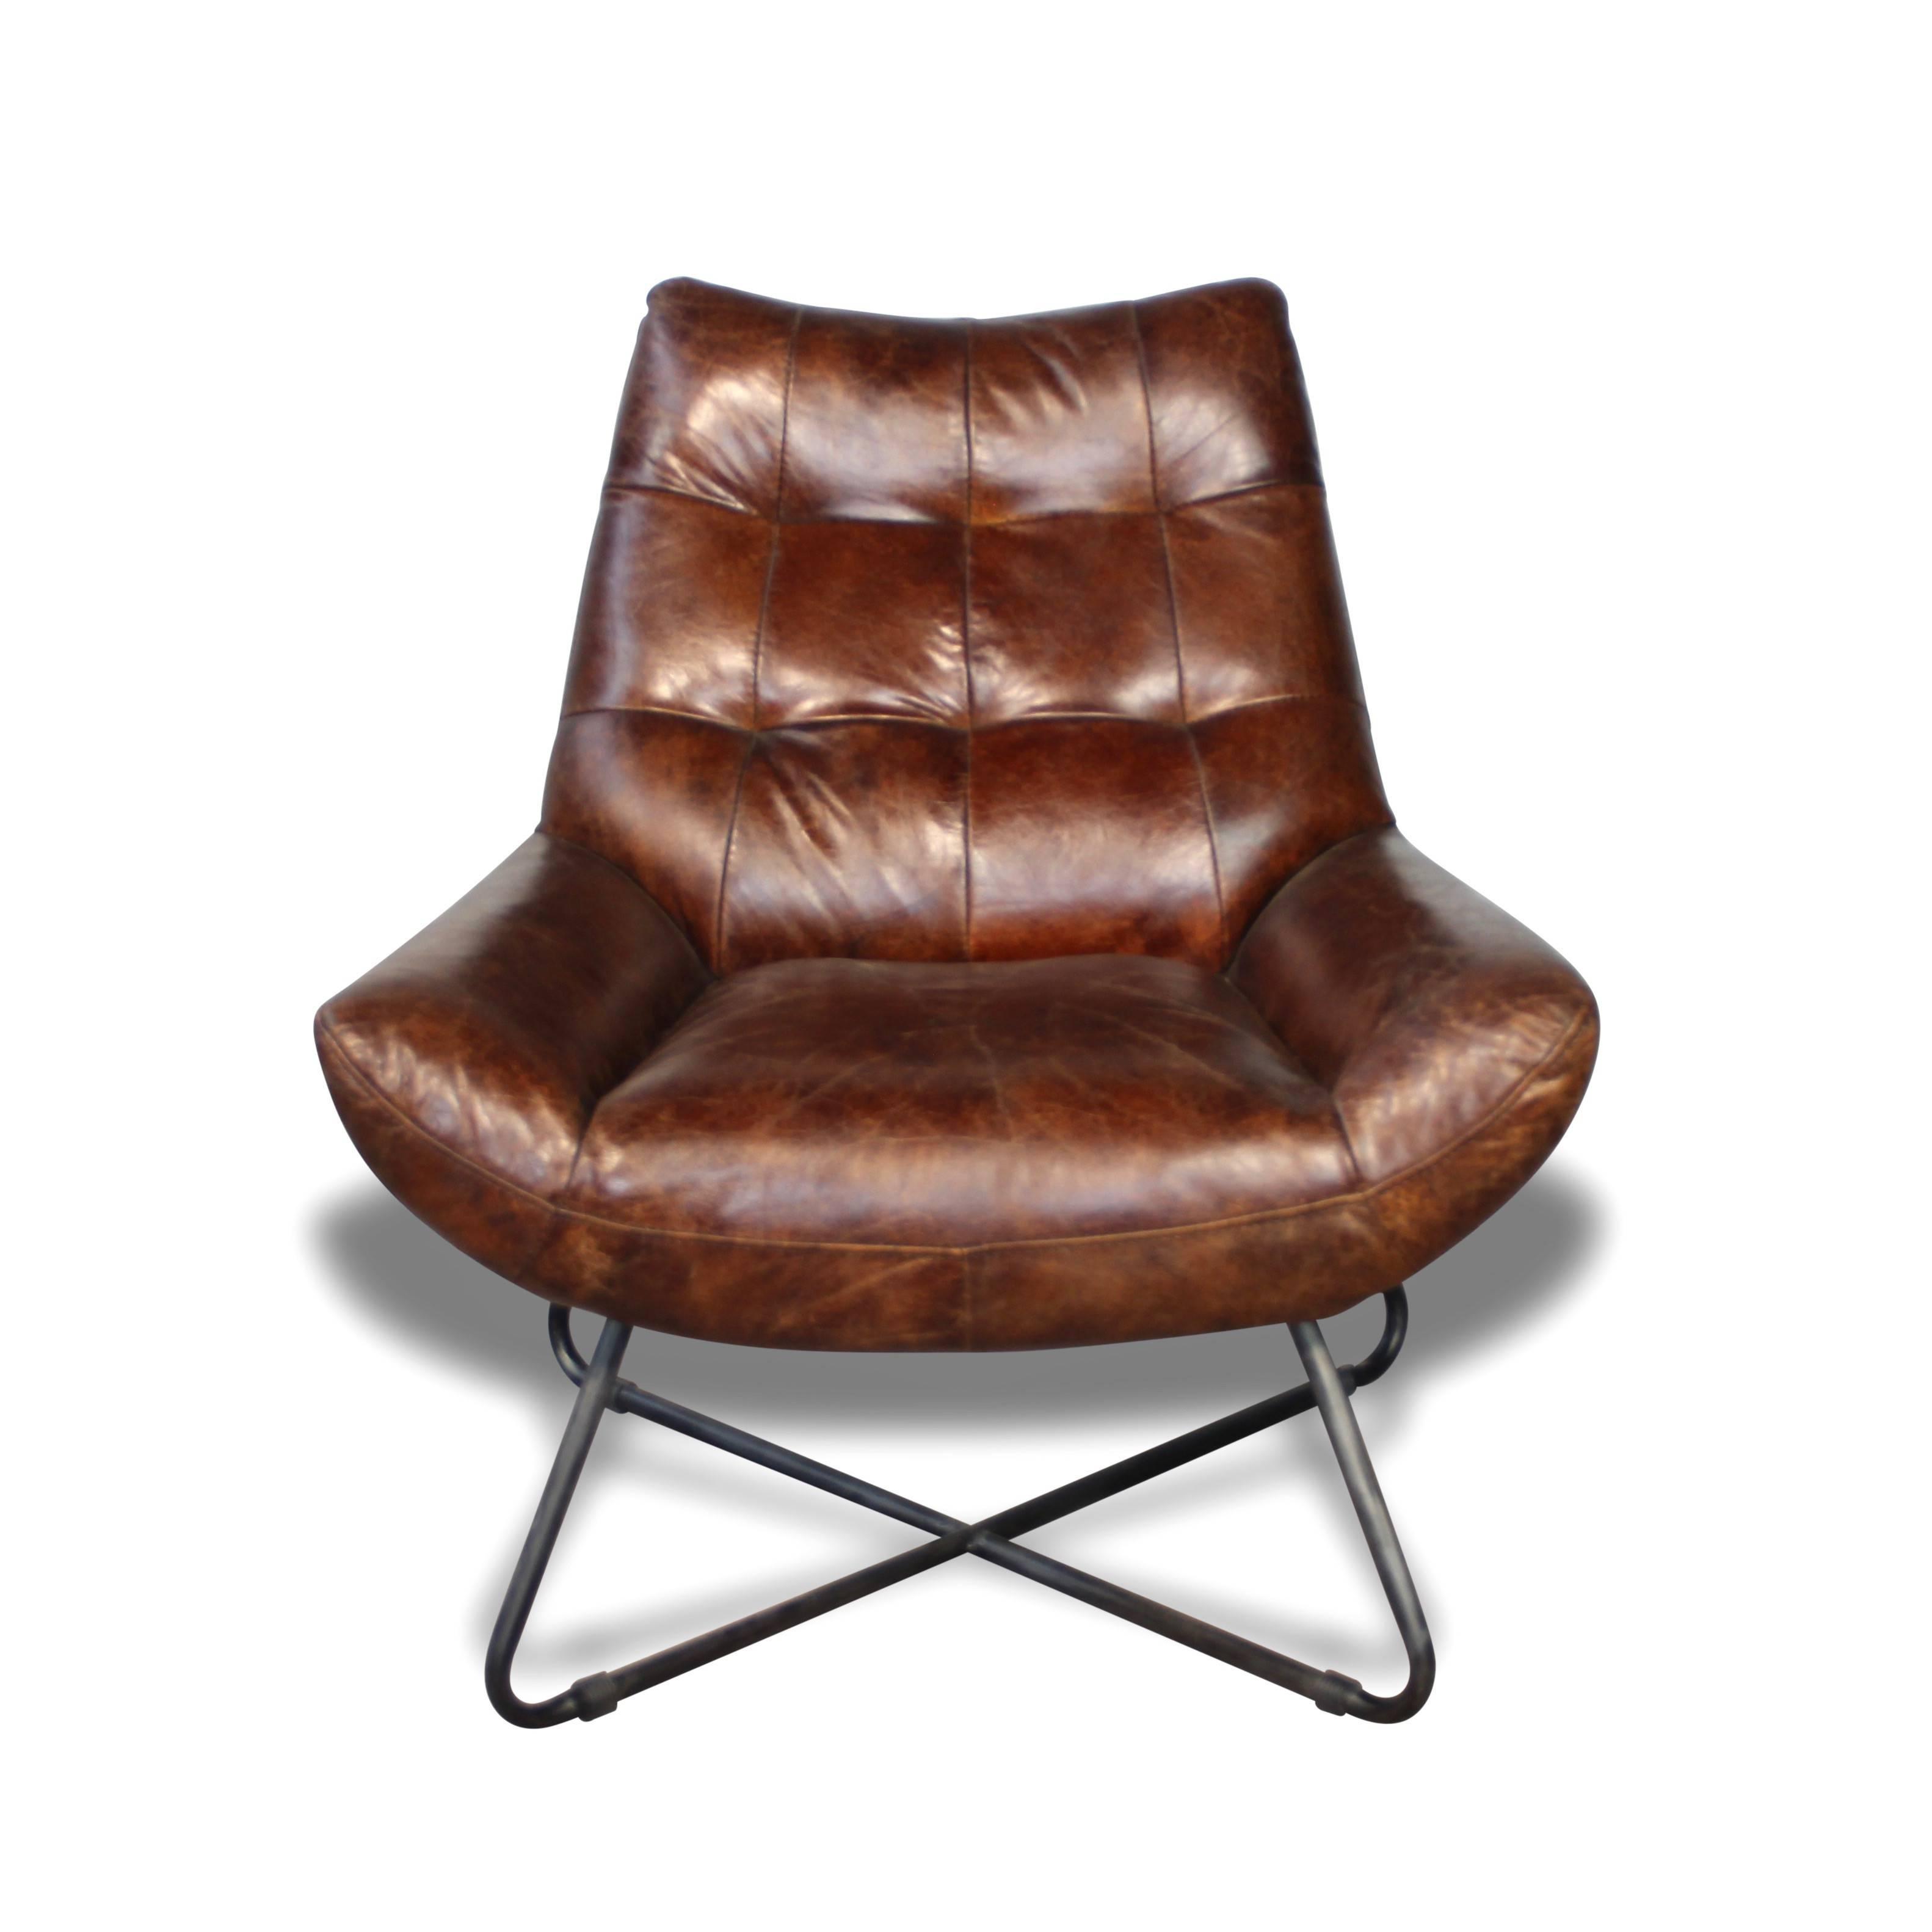 fauteuil cuir vintage simple fauteuil club cuir le bon coin best salon club cuir fabulous. Black Bedroom Furniture Sets. Home Design Ideas